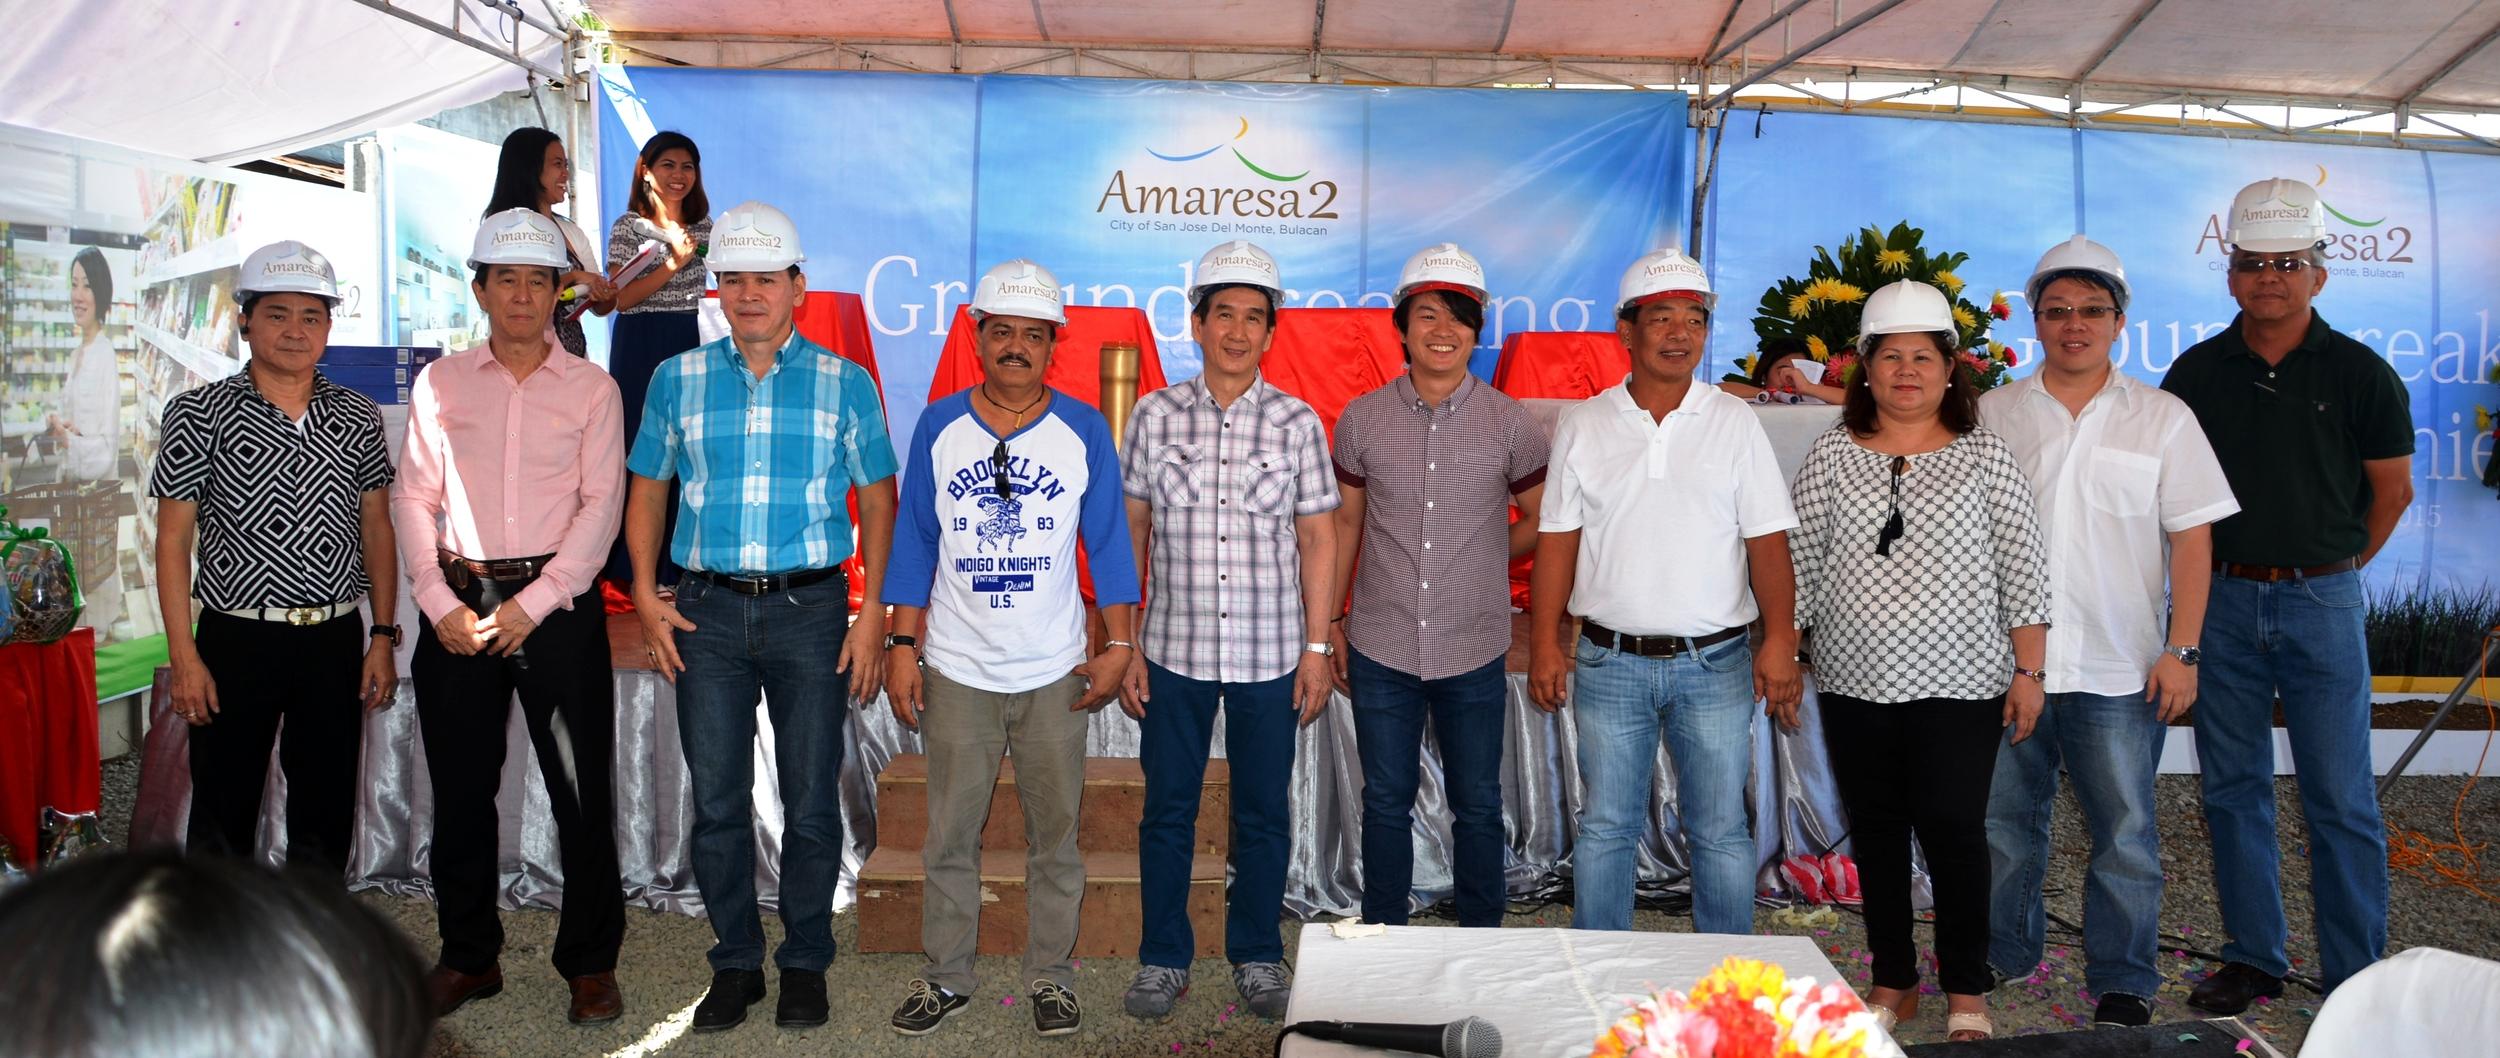 (Left-Right) Mr. Johnson Tan, Mr. Romeo Sy,Chairman Marciano Gatchalian, Kagawad of Gaya-Gaya, Mr. Andres Sy, Mr. Russell Lim, Mr. Virgilio Bucat, Ms. Luna Gallaza, Mr. Alfie Sy and Engr. Rene Tiongson